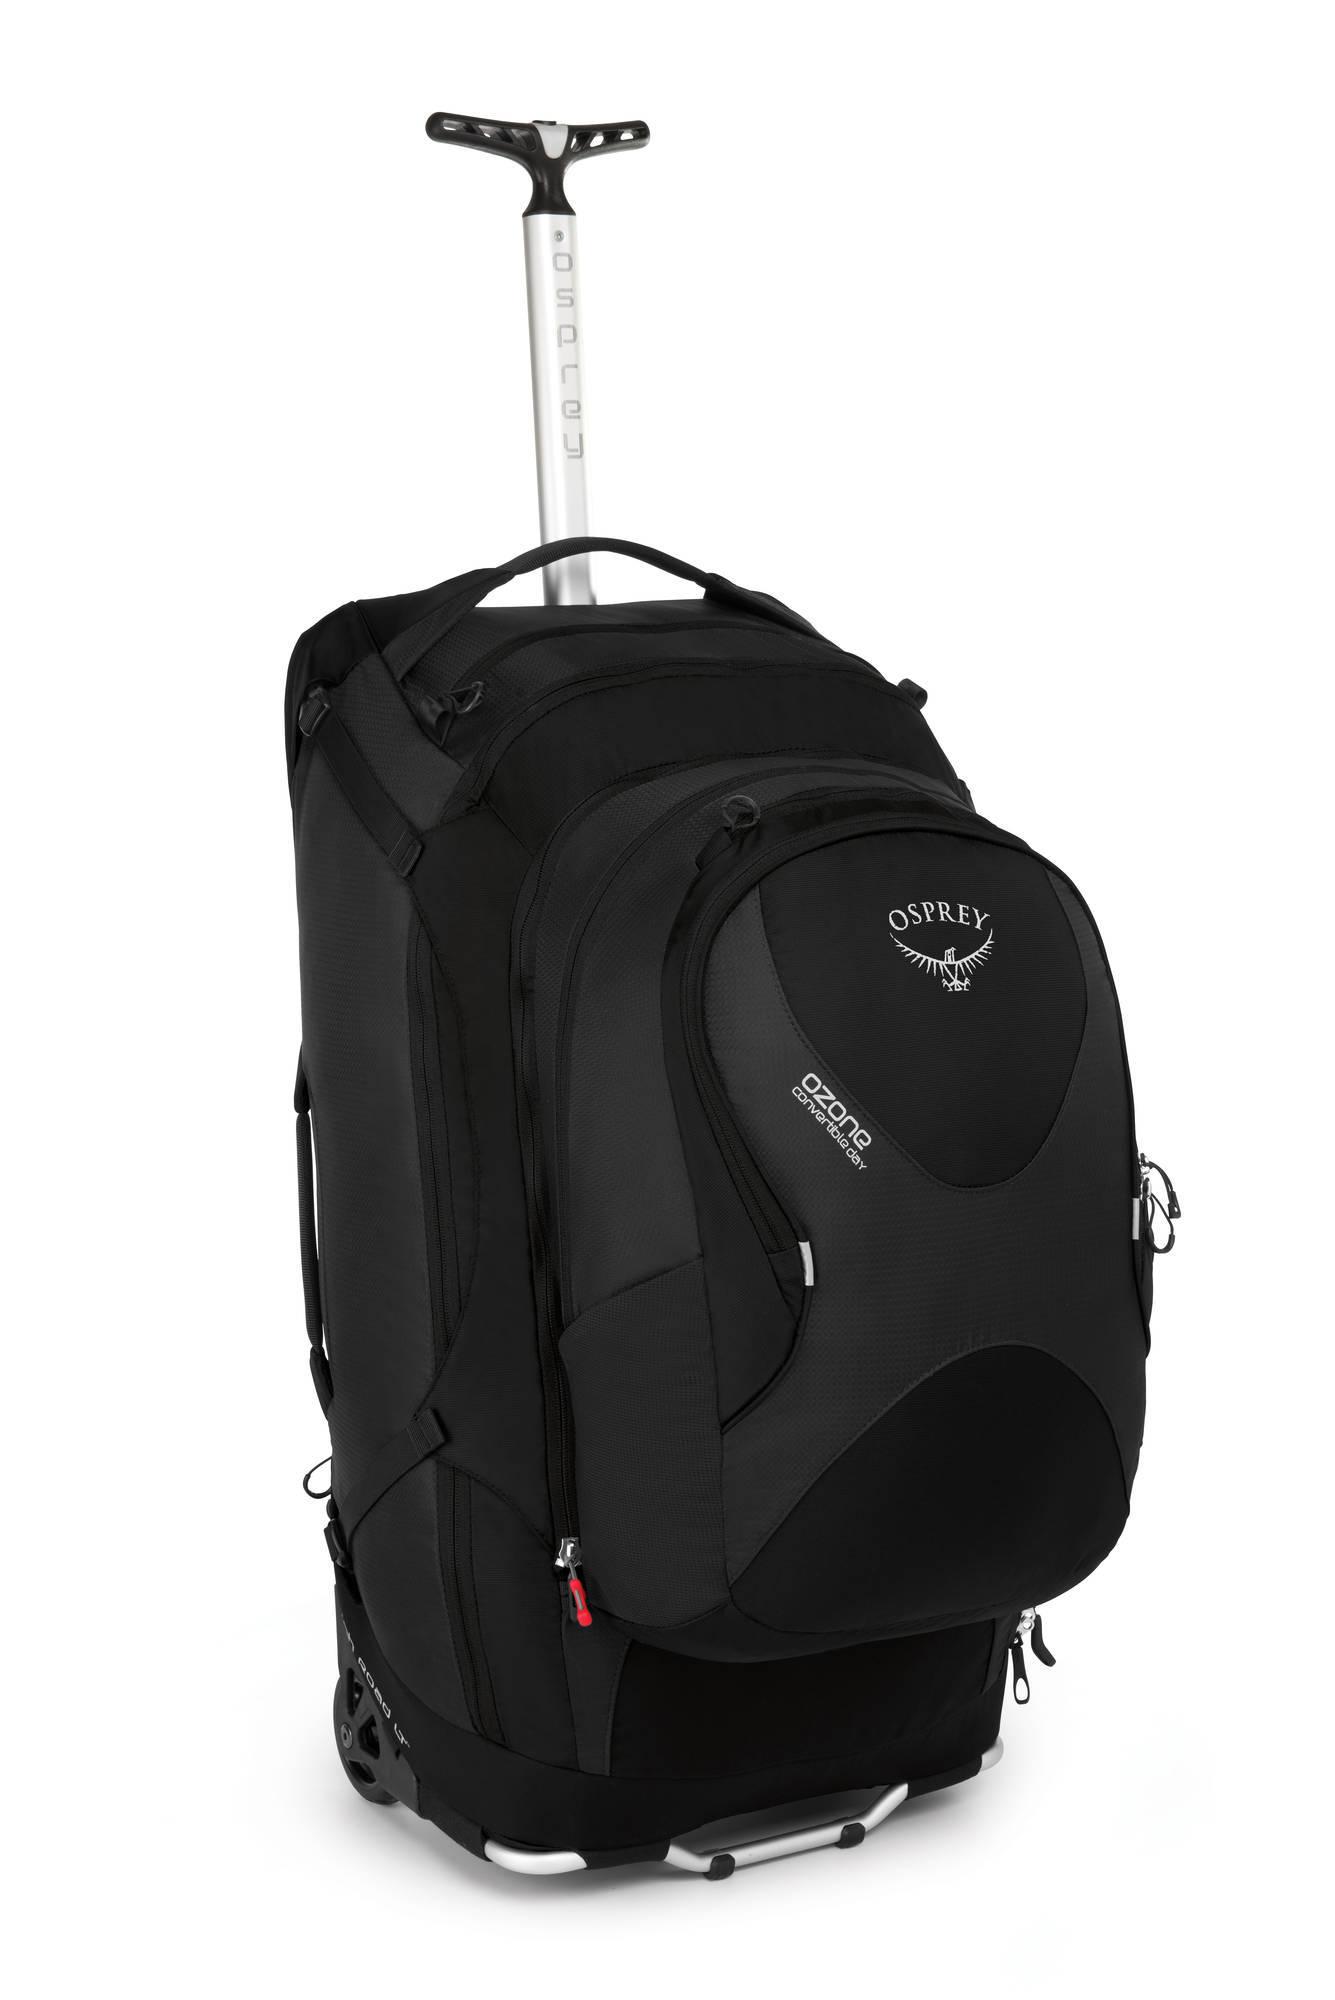 Сумки на колесах Сумка-рюкзак на колесах Osprey Ozone 75 Convertible Ozone_75_Convertible_Side_Black_web.jpg